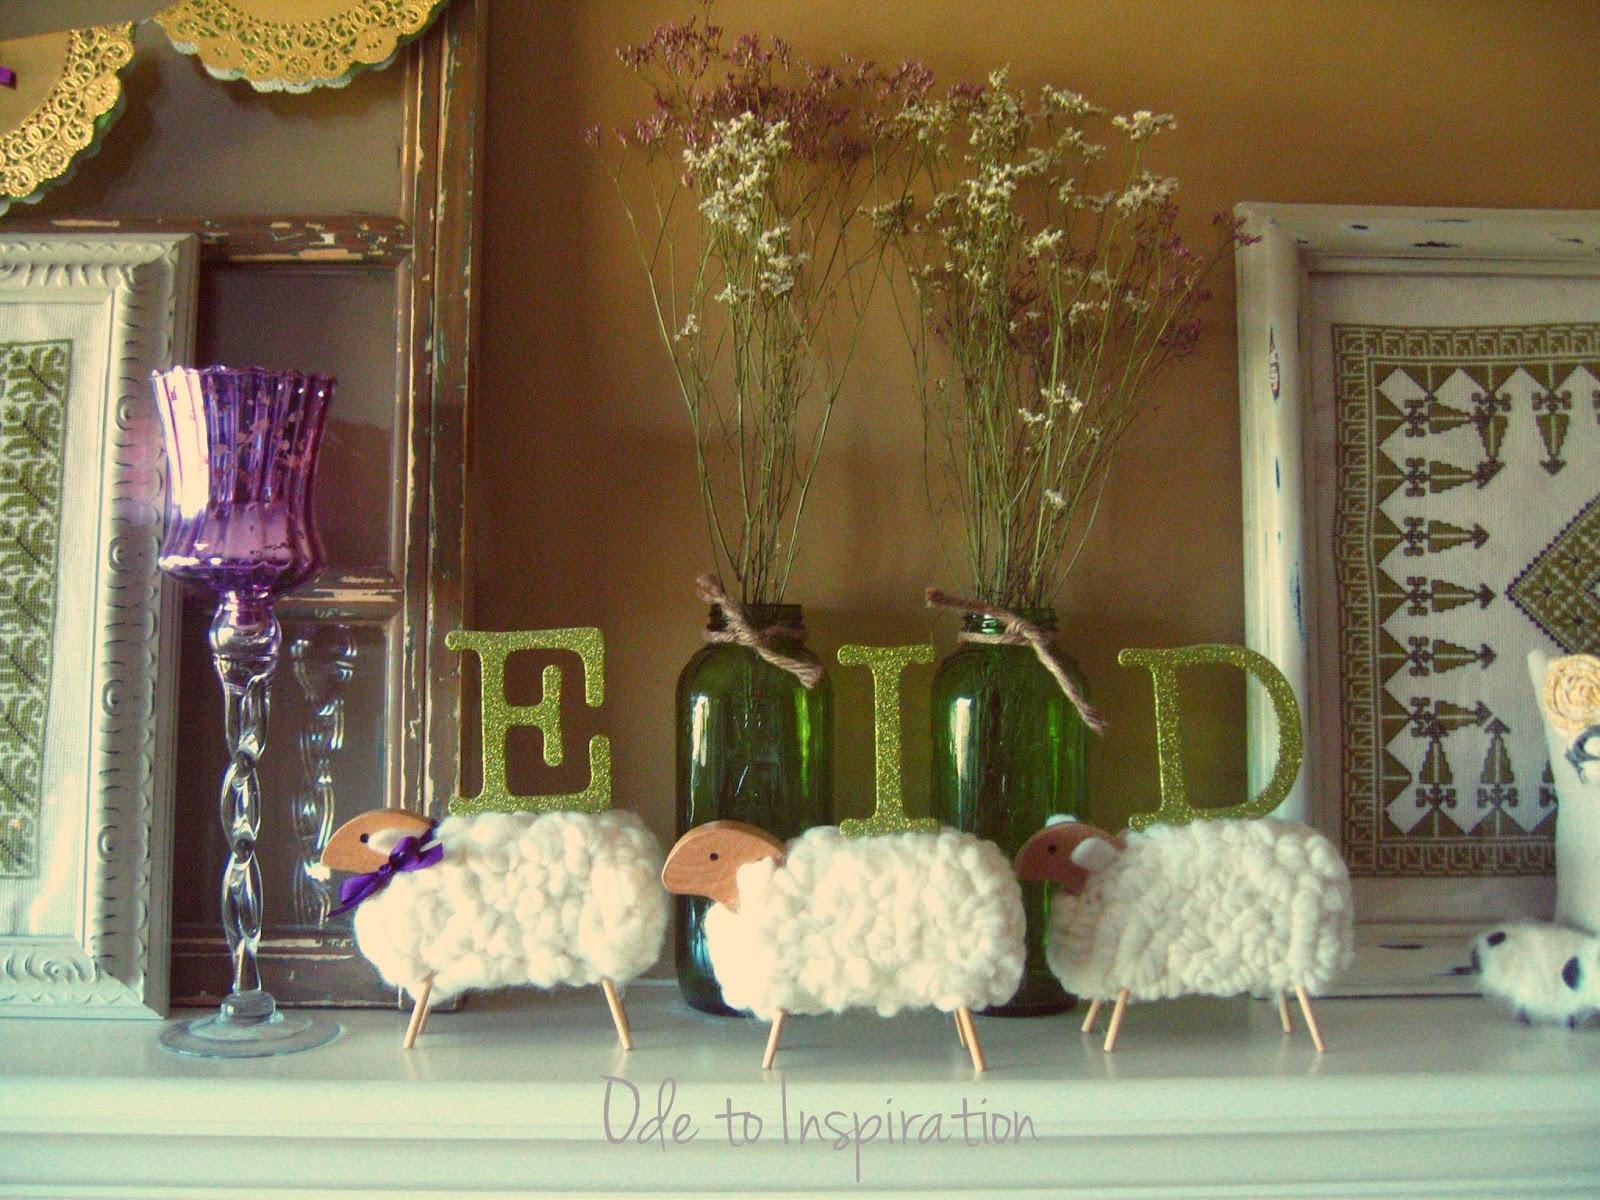 Great Homemade Eid Al-Fitr Decorations - Eid-lambs-Decorations1  Snapshot_246881 .jpg